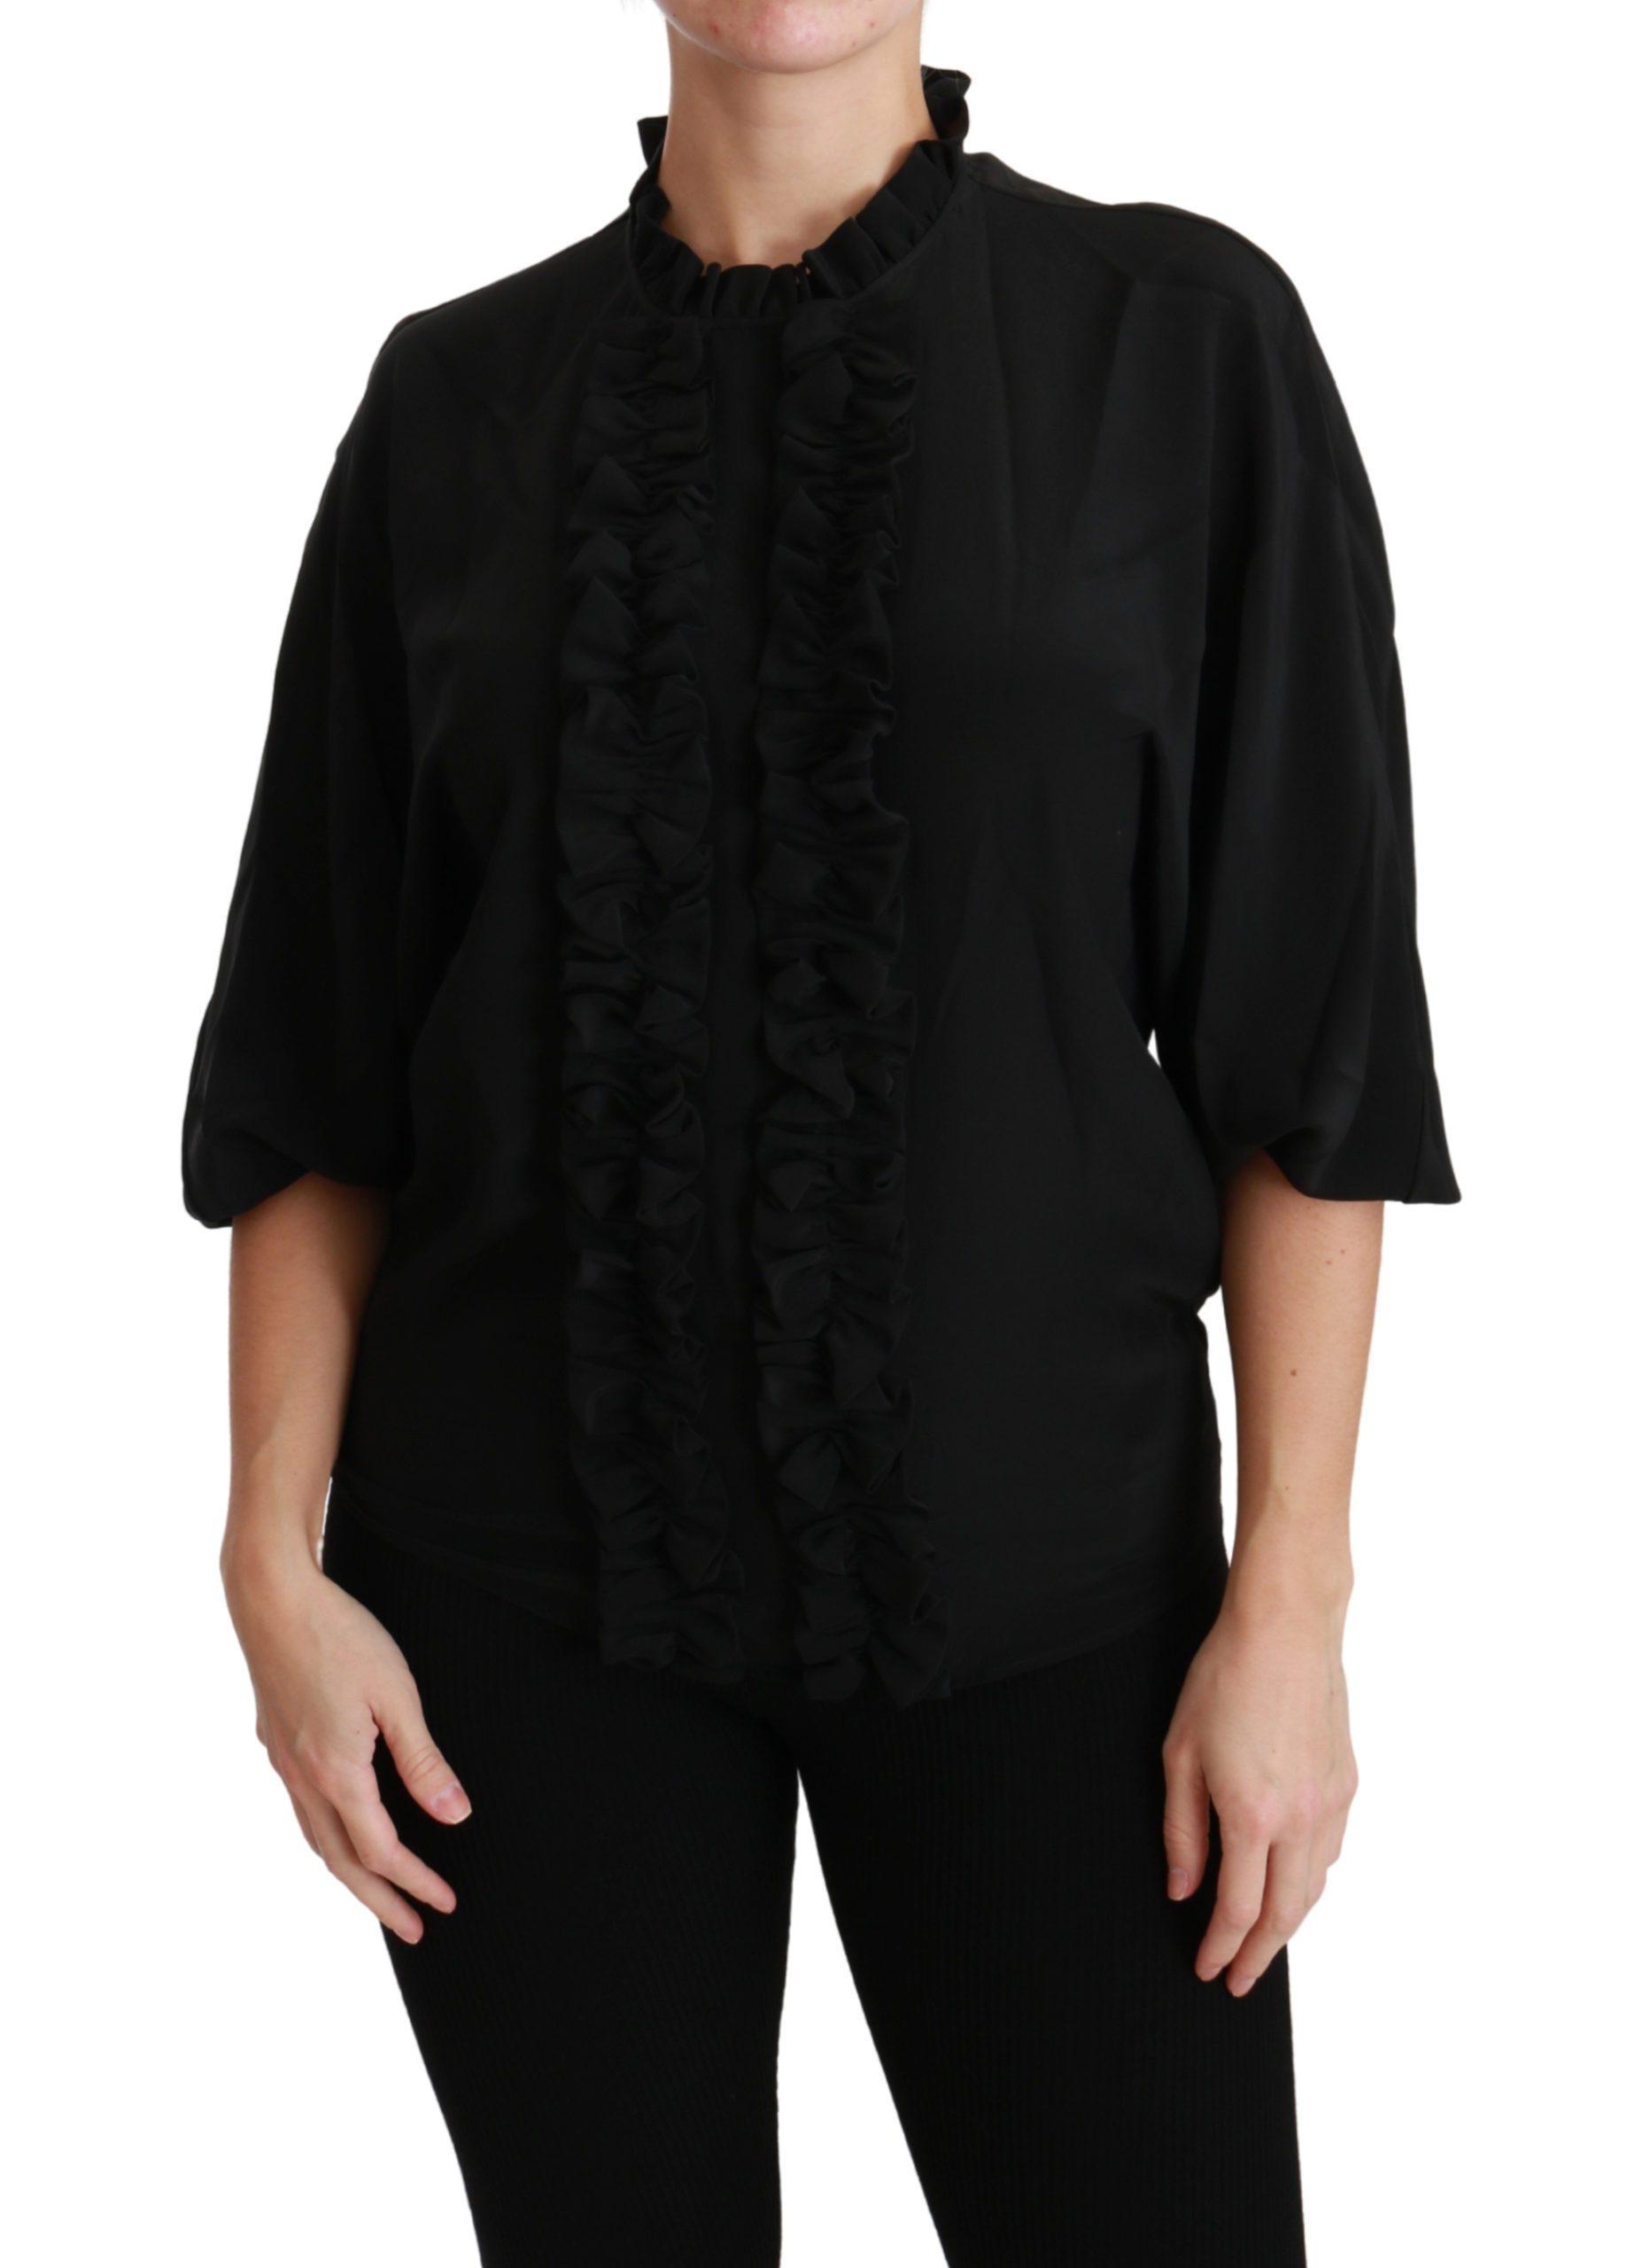 Black Silk Shirt Ruffled Top Blouse - IT36 | XS